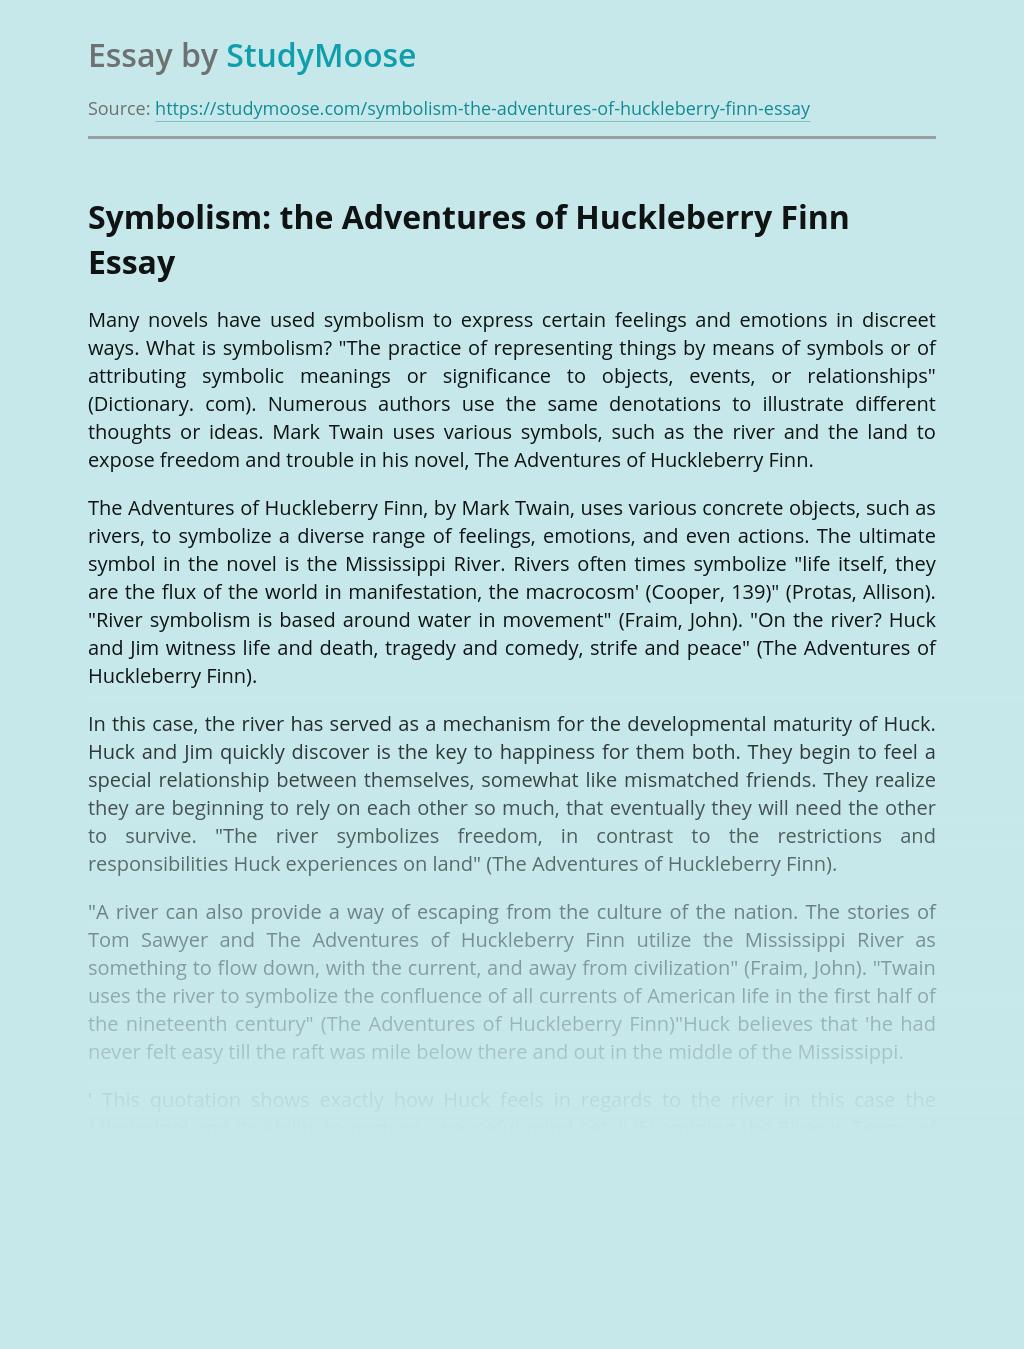 Symbolism: the Adventures of Huckleberry Finn